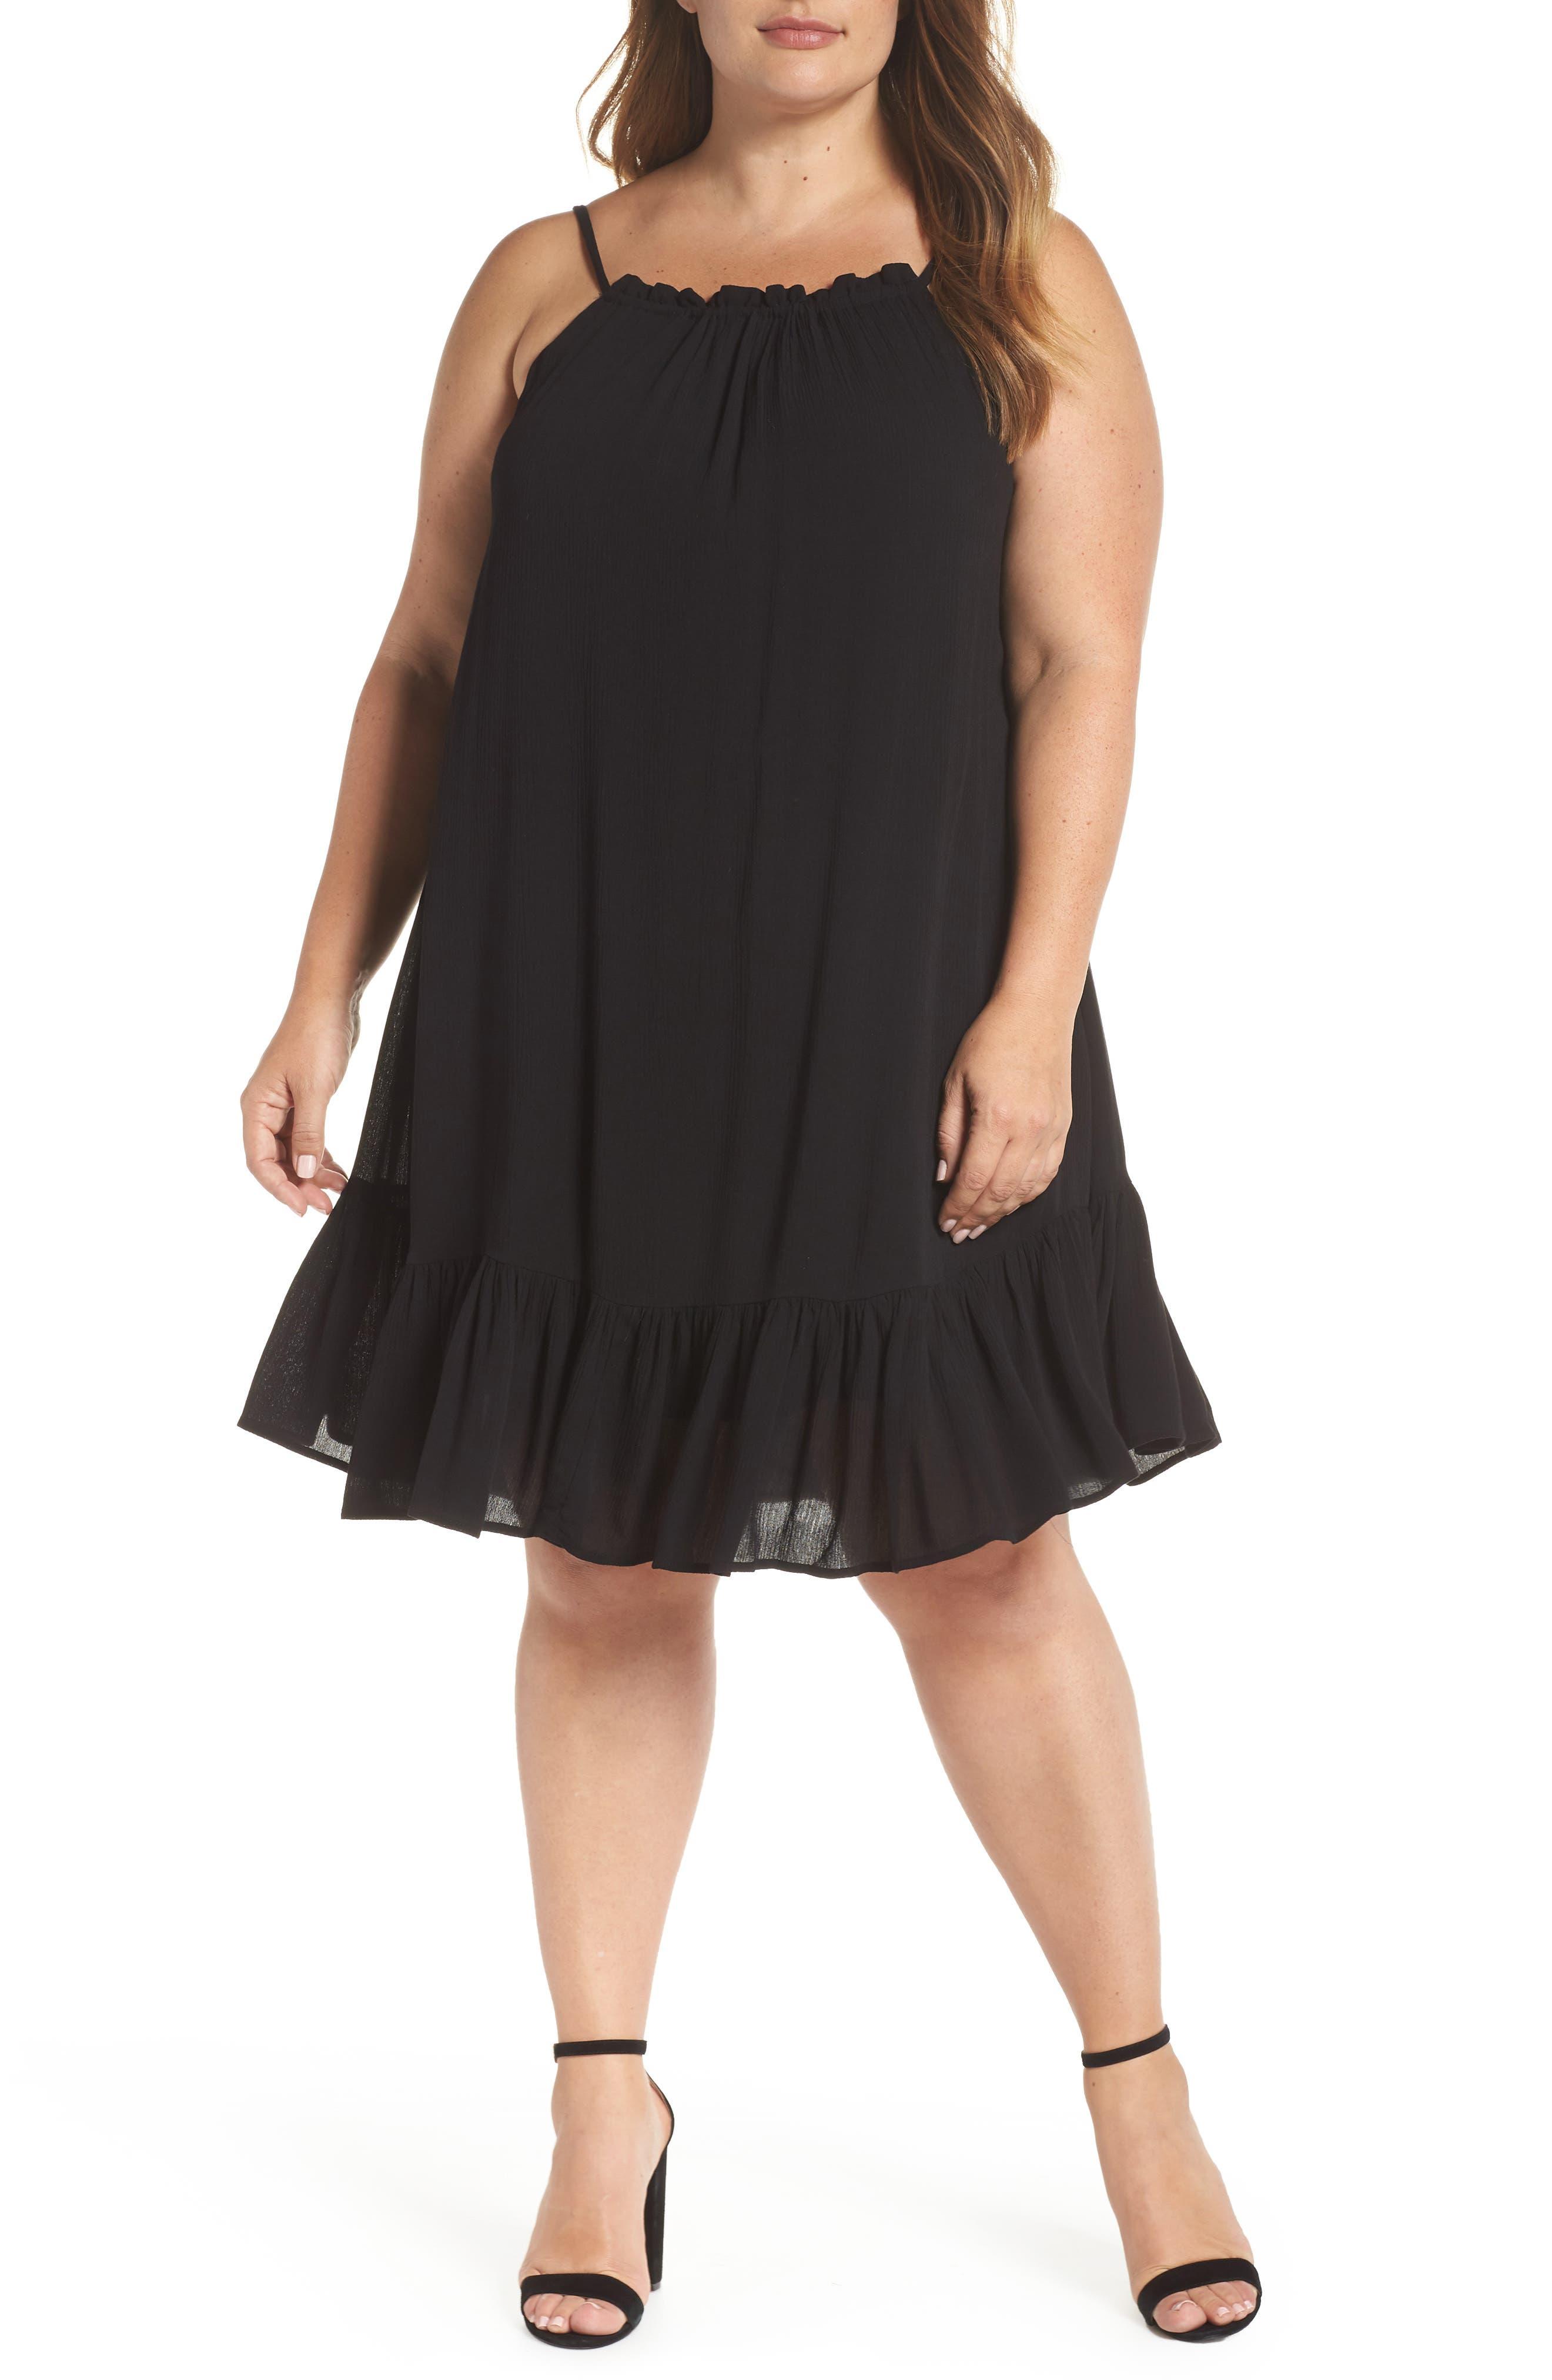 Liz Halter Top Baby Doll Dress,                         Main,                         color, 001